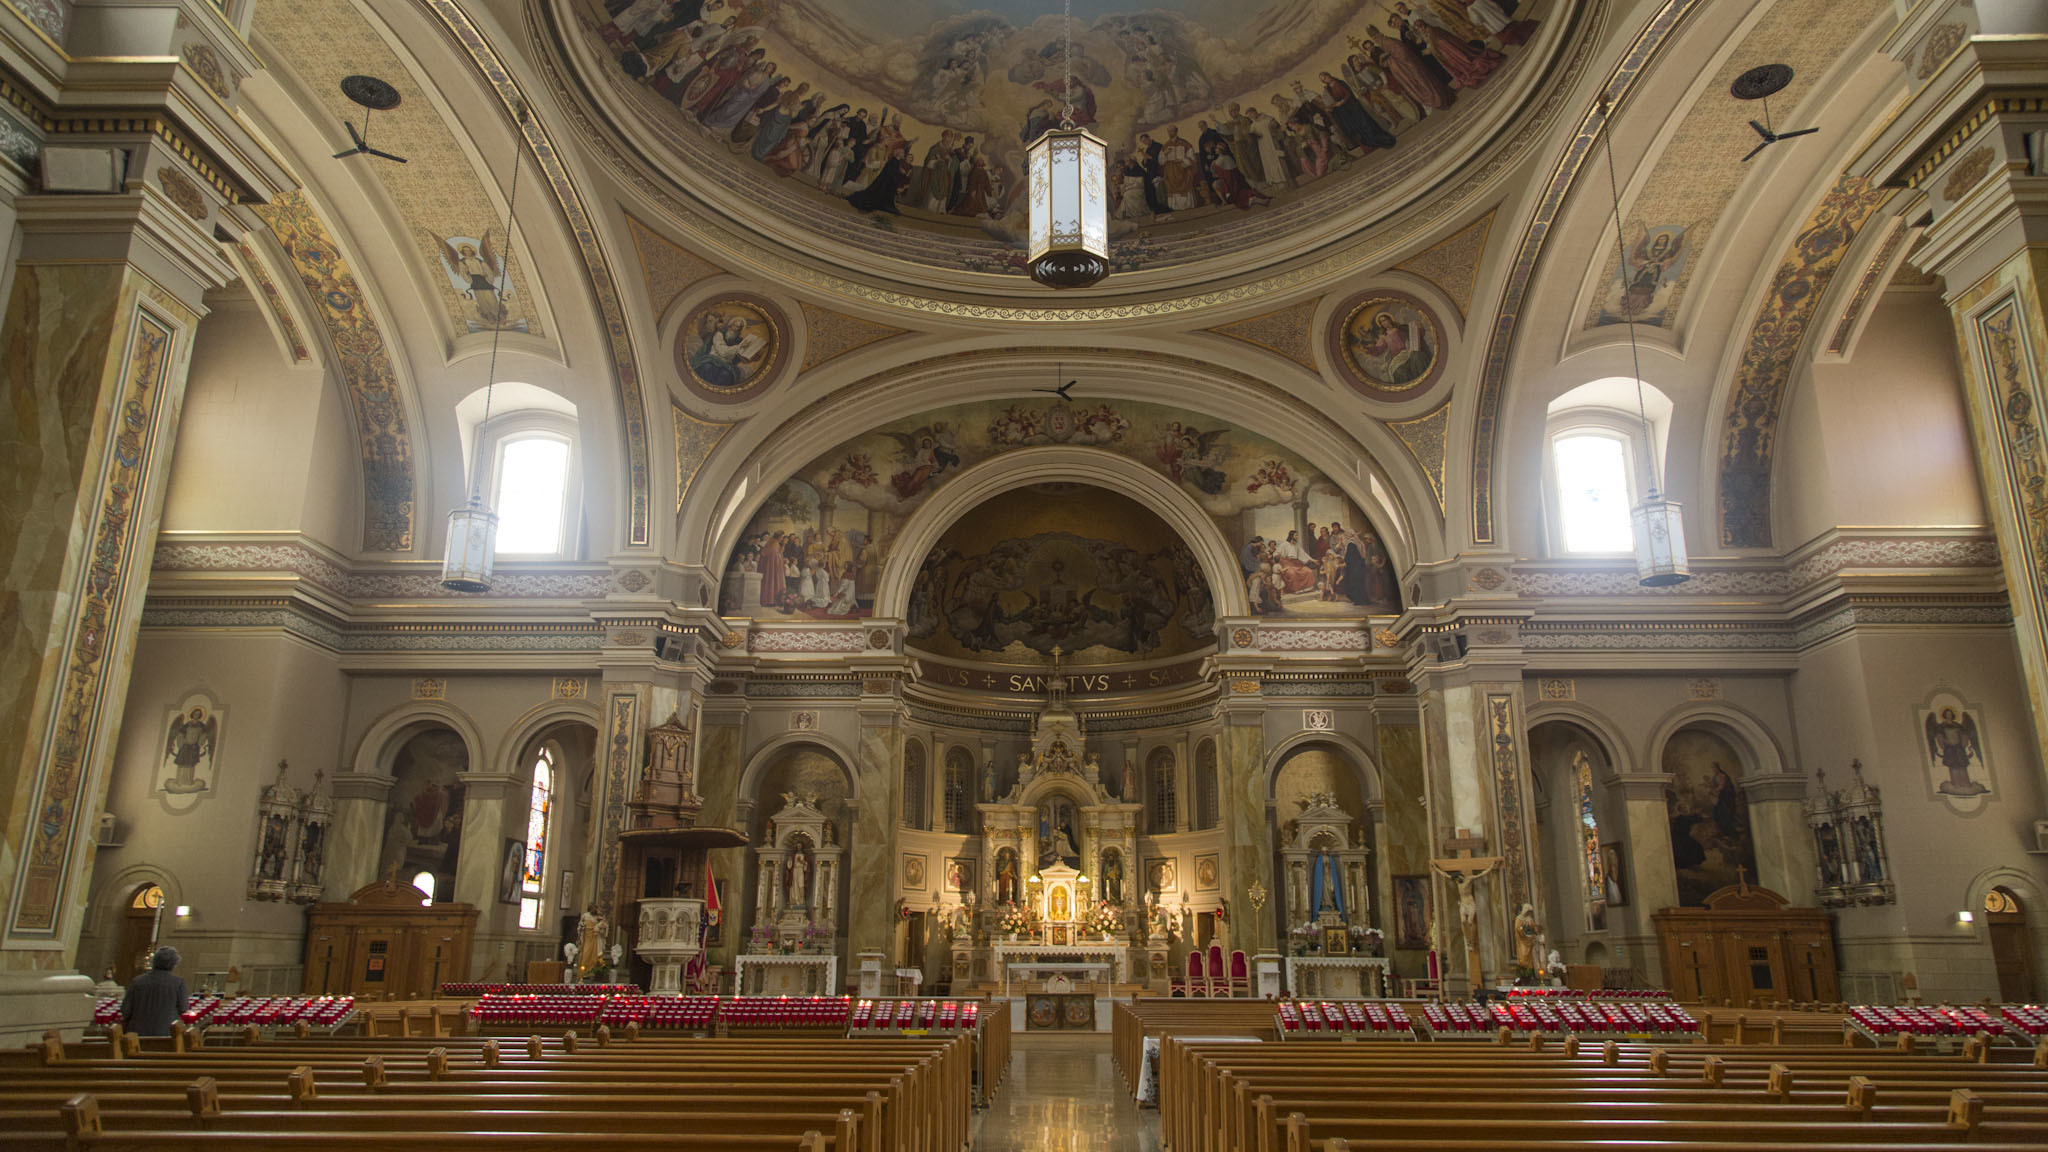 Basilica of St. Hyacinth